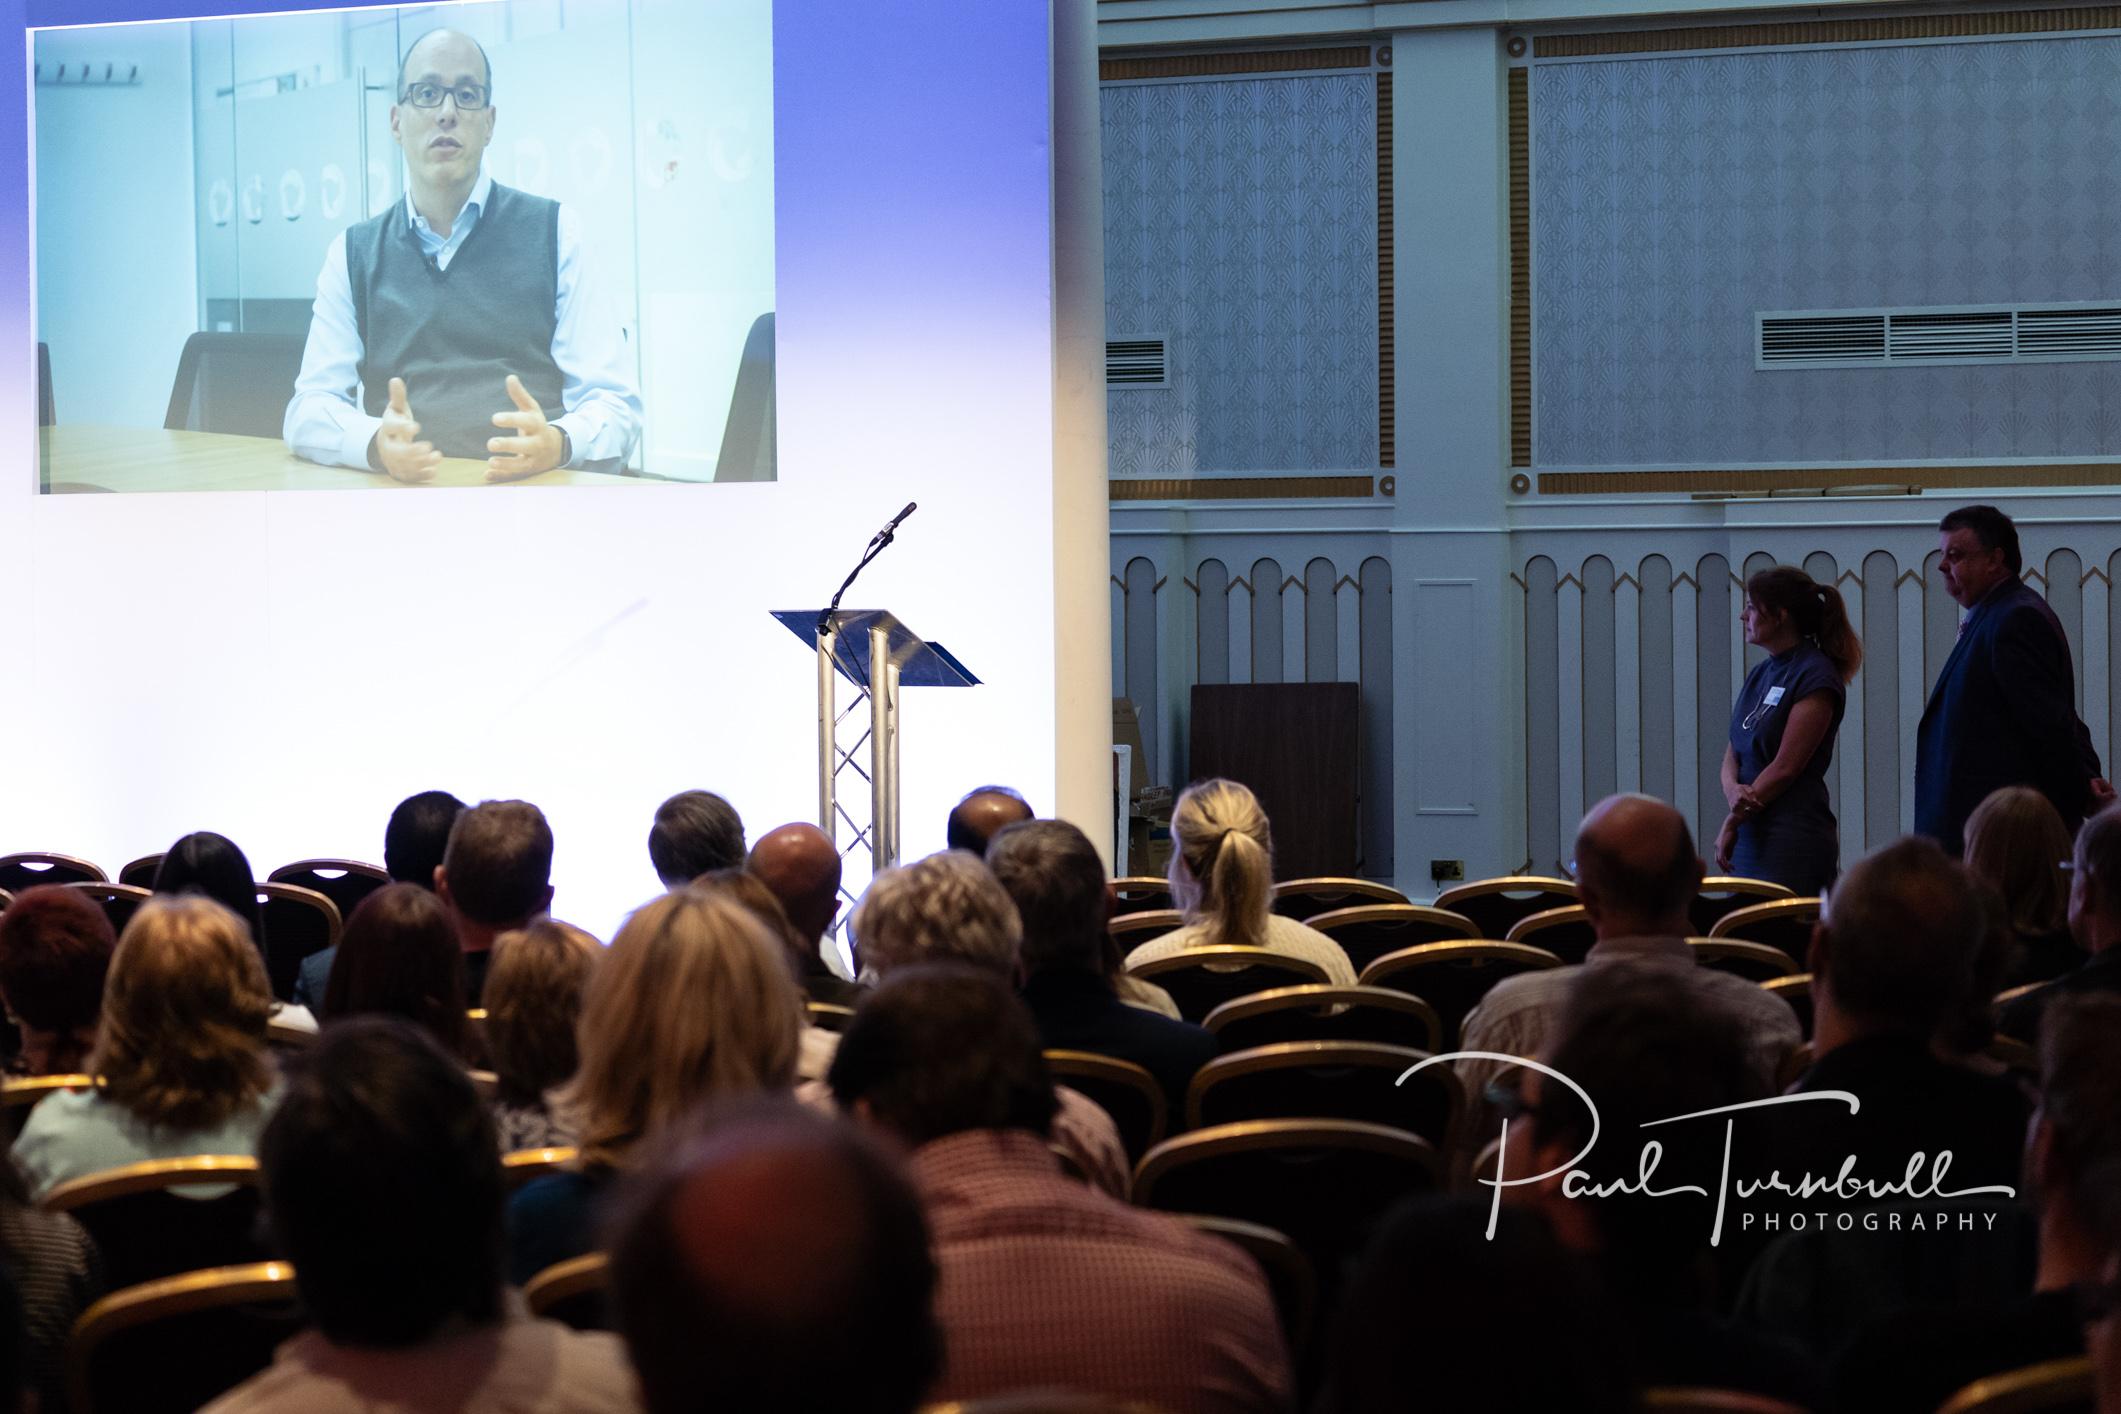 conference-event-photographer-queens-hotel-leeds-yorkshire-040.jpg